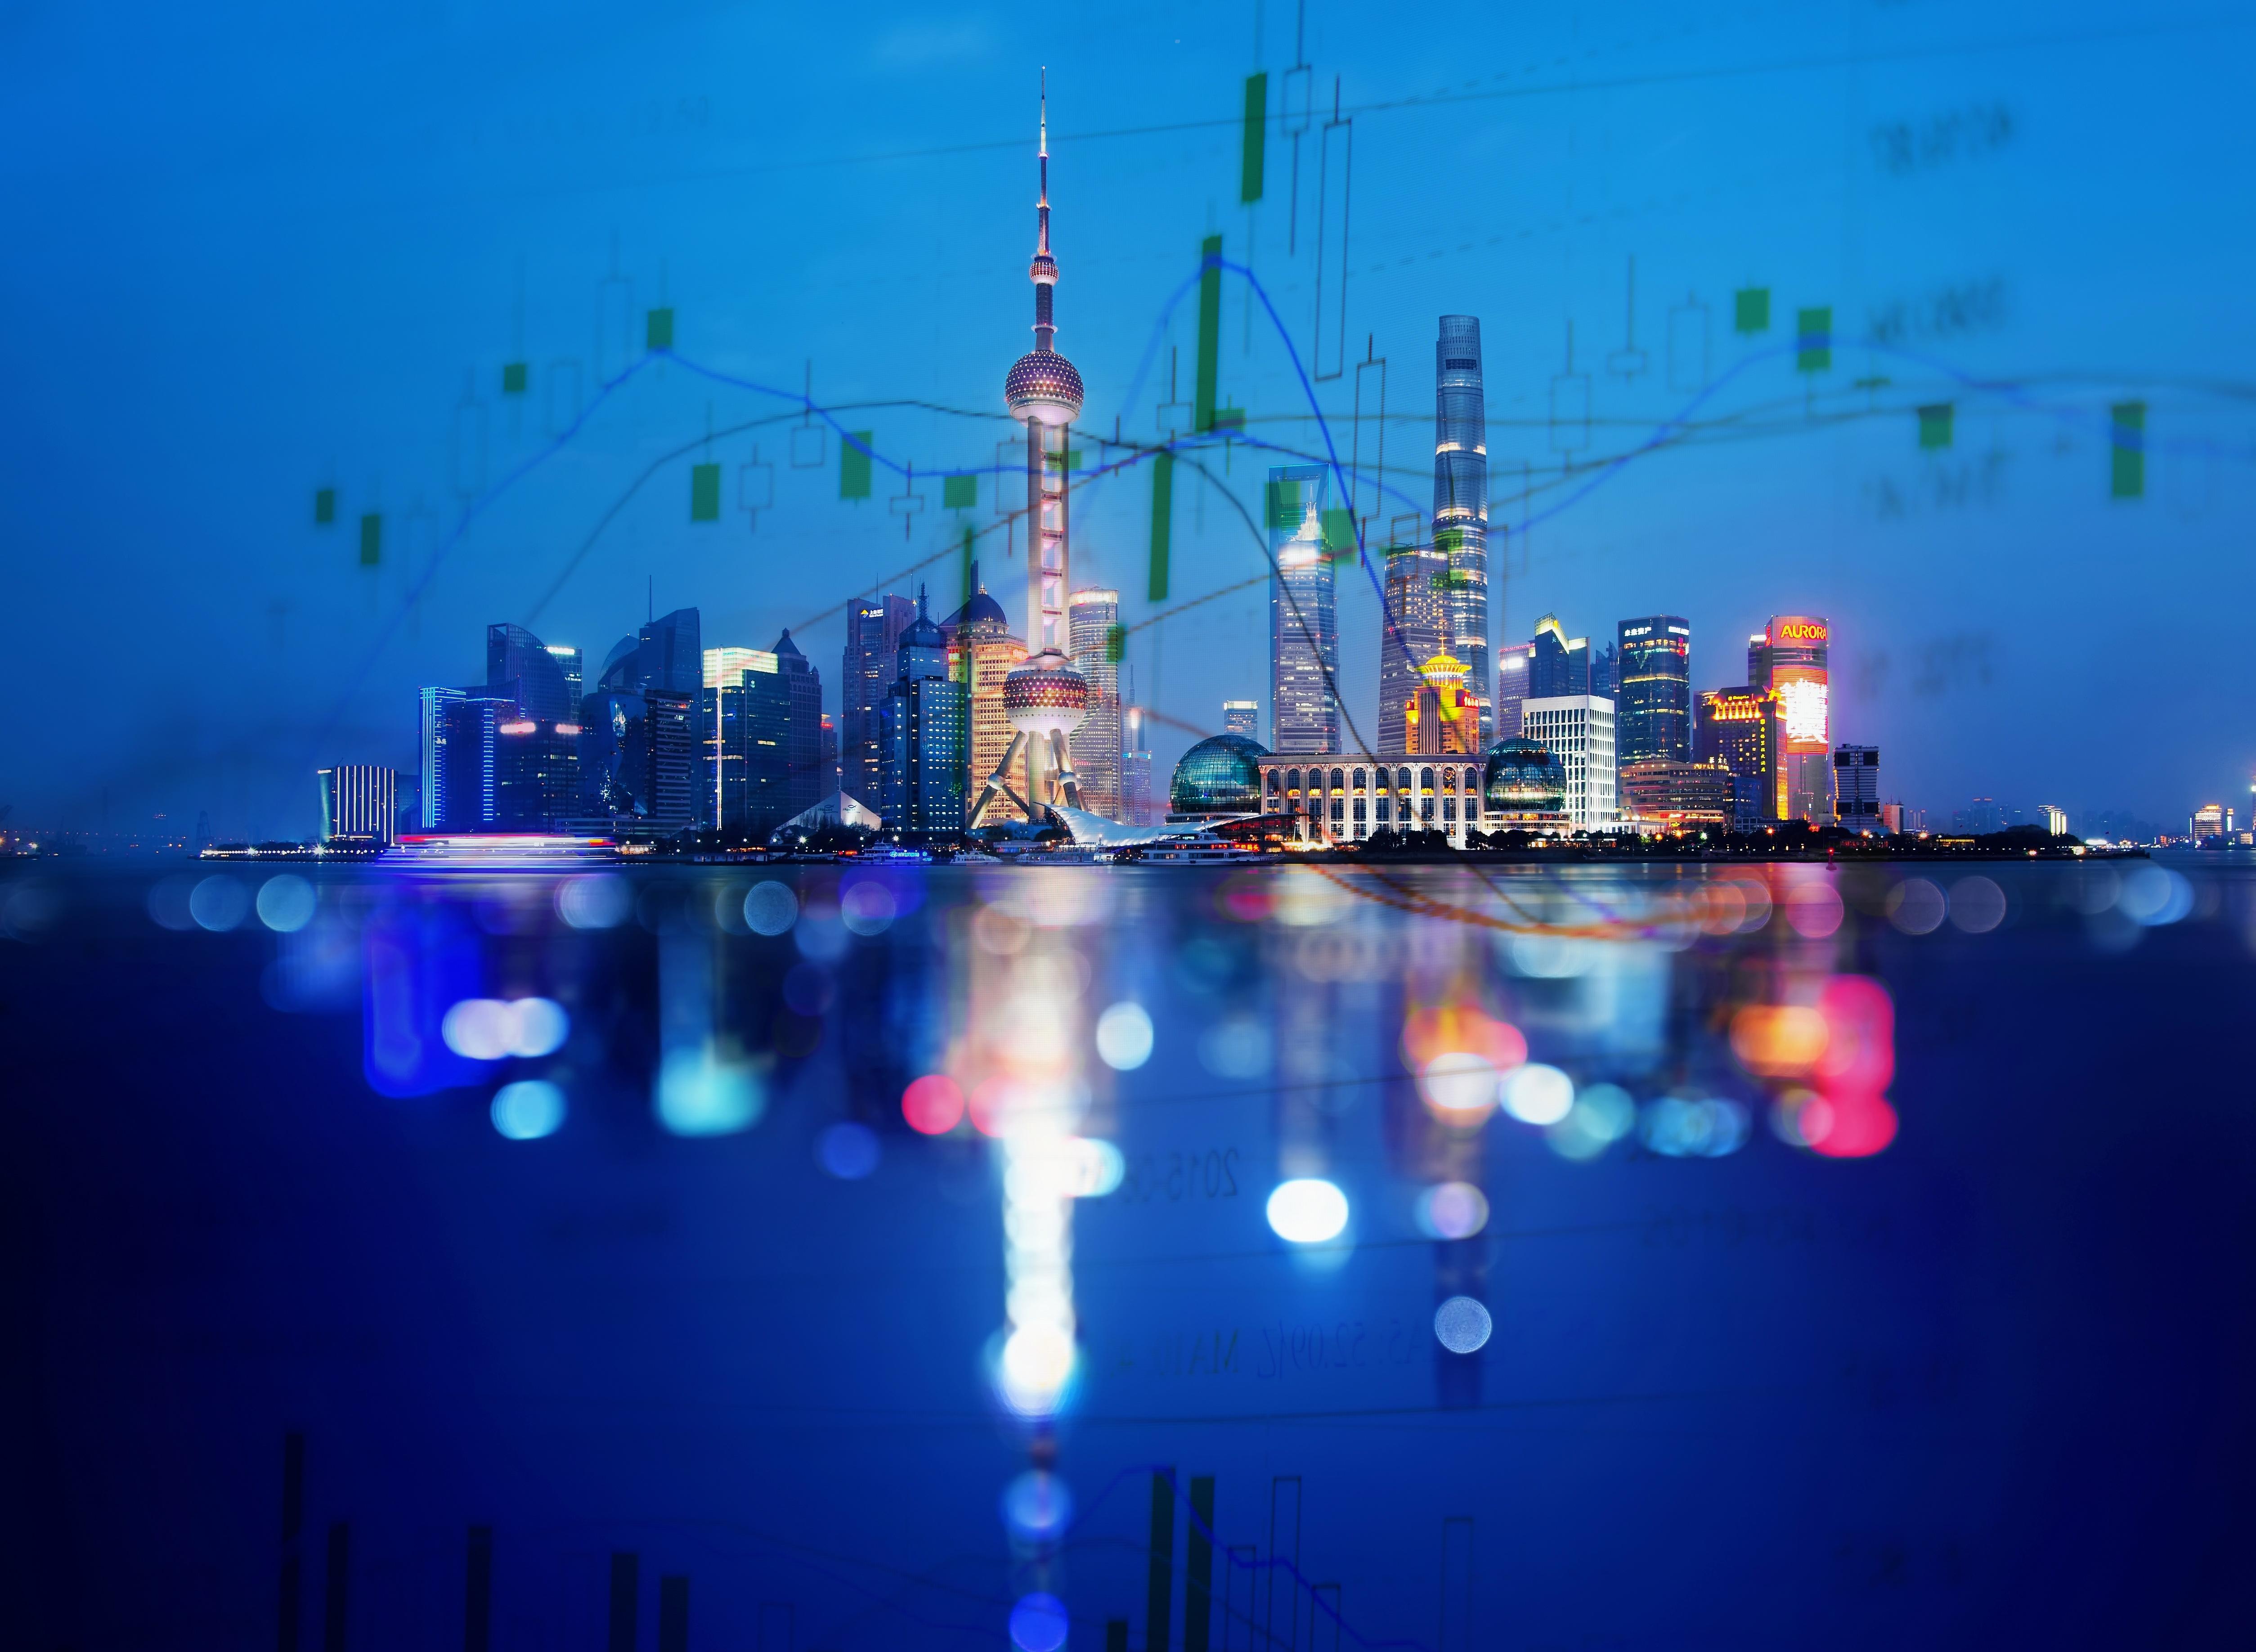 Trend of Shanghai City Scenery Data